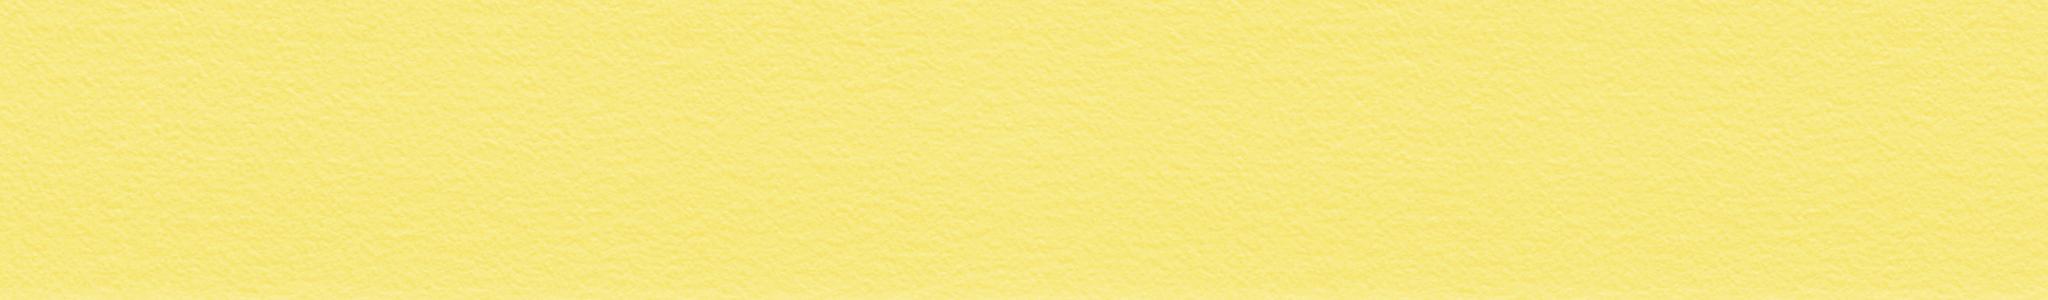 HU 111509 ABS Kante UNI Gelb feinperl 107